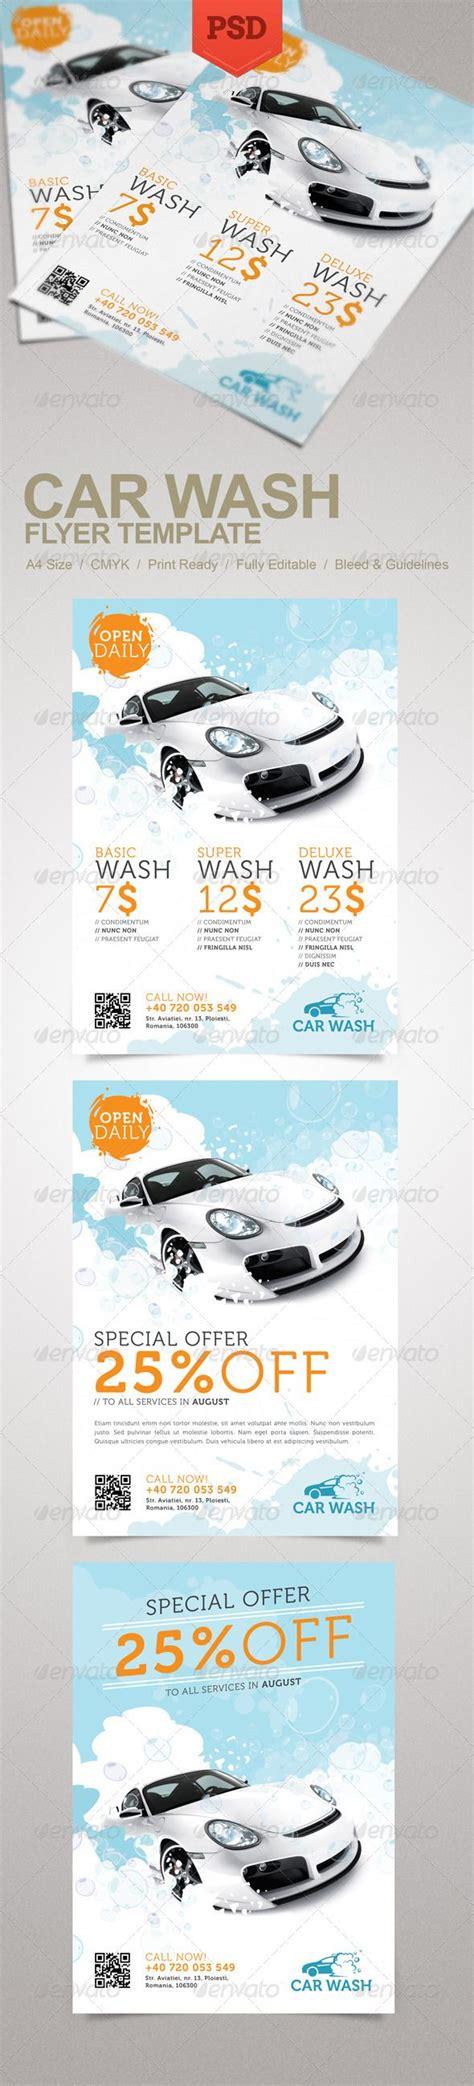 car wash template car wash flyer creative flyers car wash and flyer template